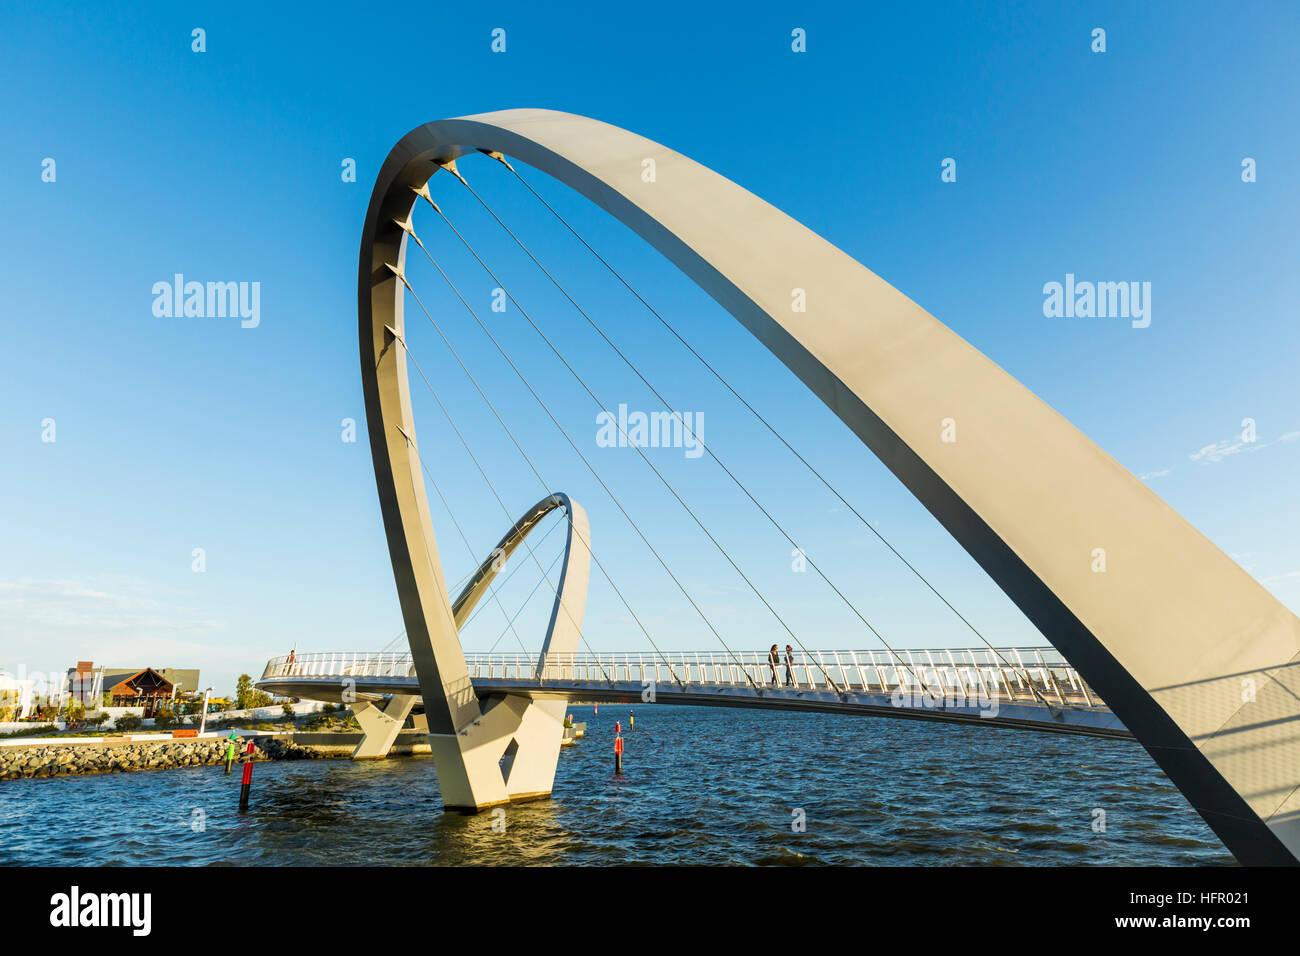 The Elizabeth Quay pedestrian bridge on the Swan River at sunset, Perth, Western Australia, Australia - Stock Image